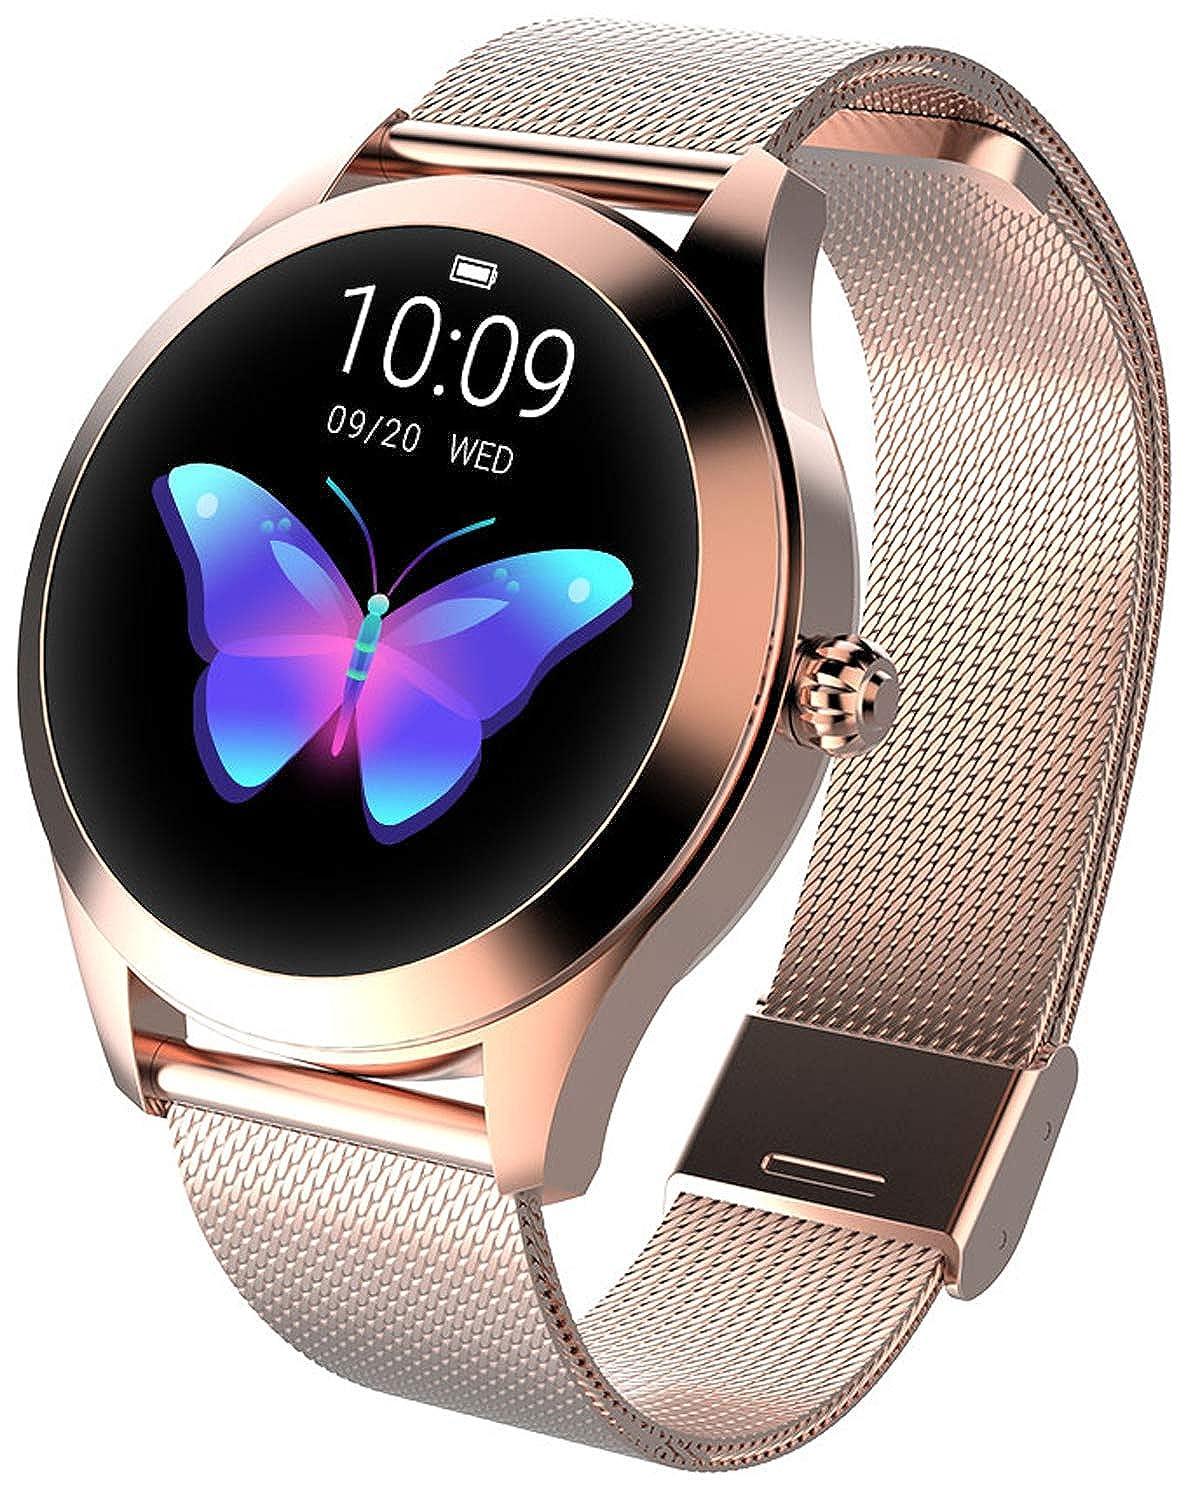 Amazon.com: Bluetooth Smartwatch for Women Calorie Counter ...